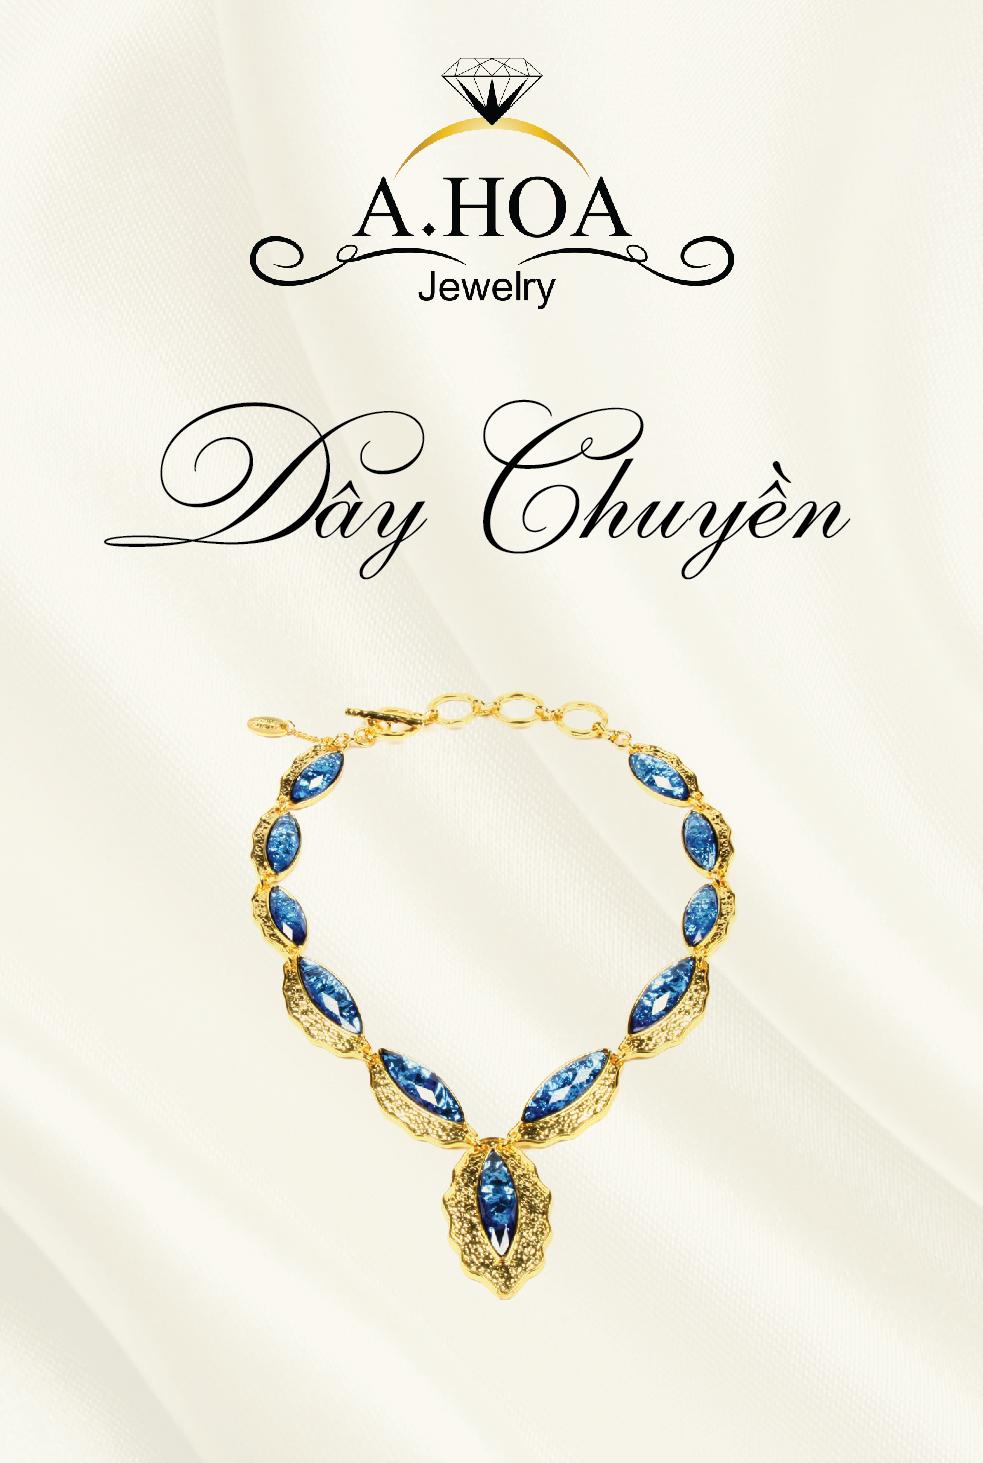 daychuyen-02